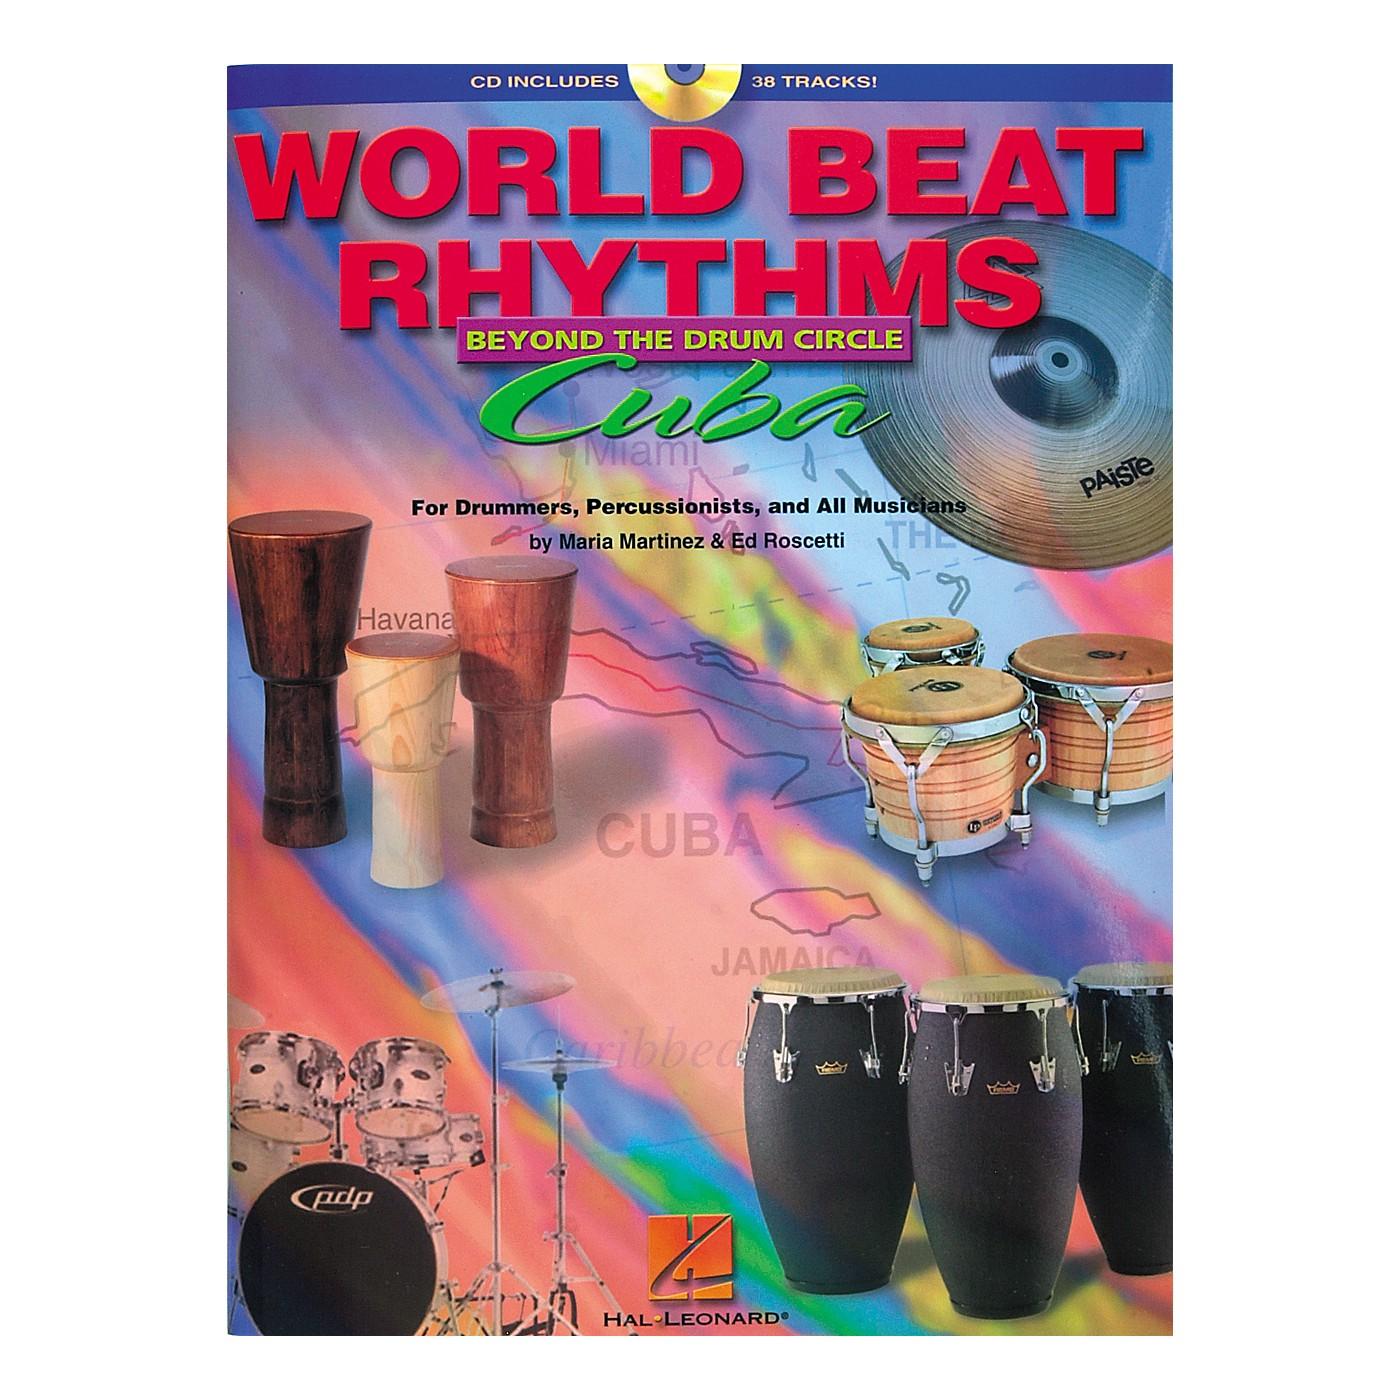 Hal Leonard World Beat Rhythms Beyond The Drum Circle - Cuba (Book/CD) thumbnail